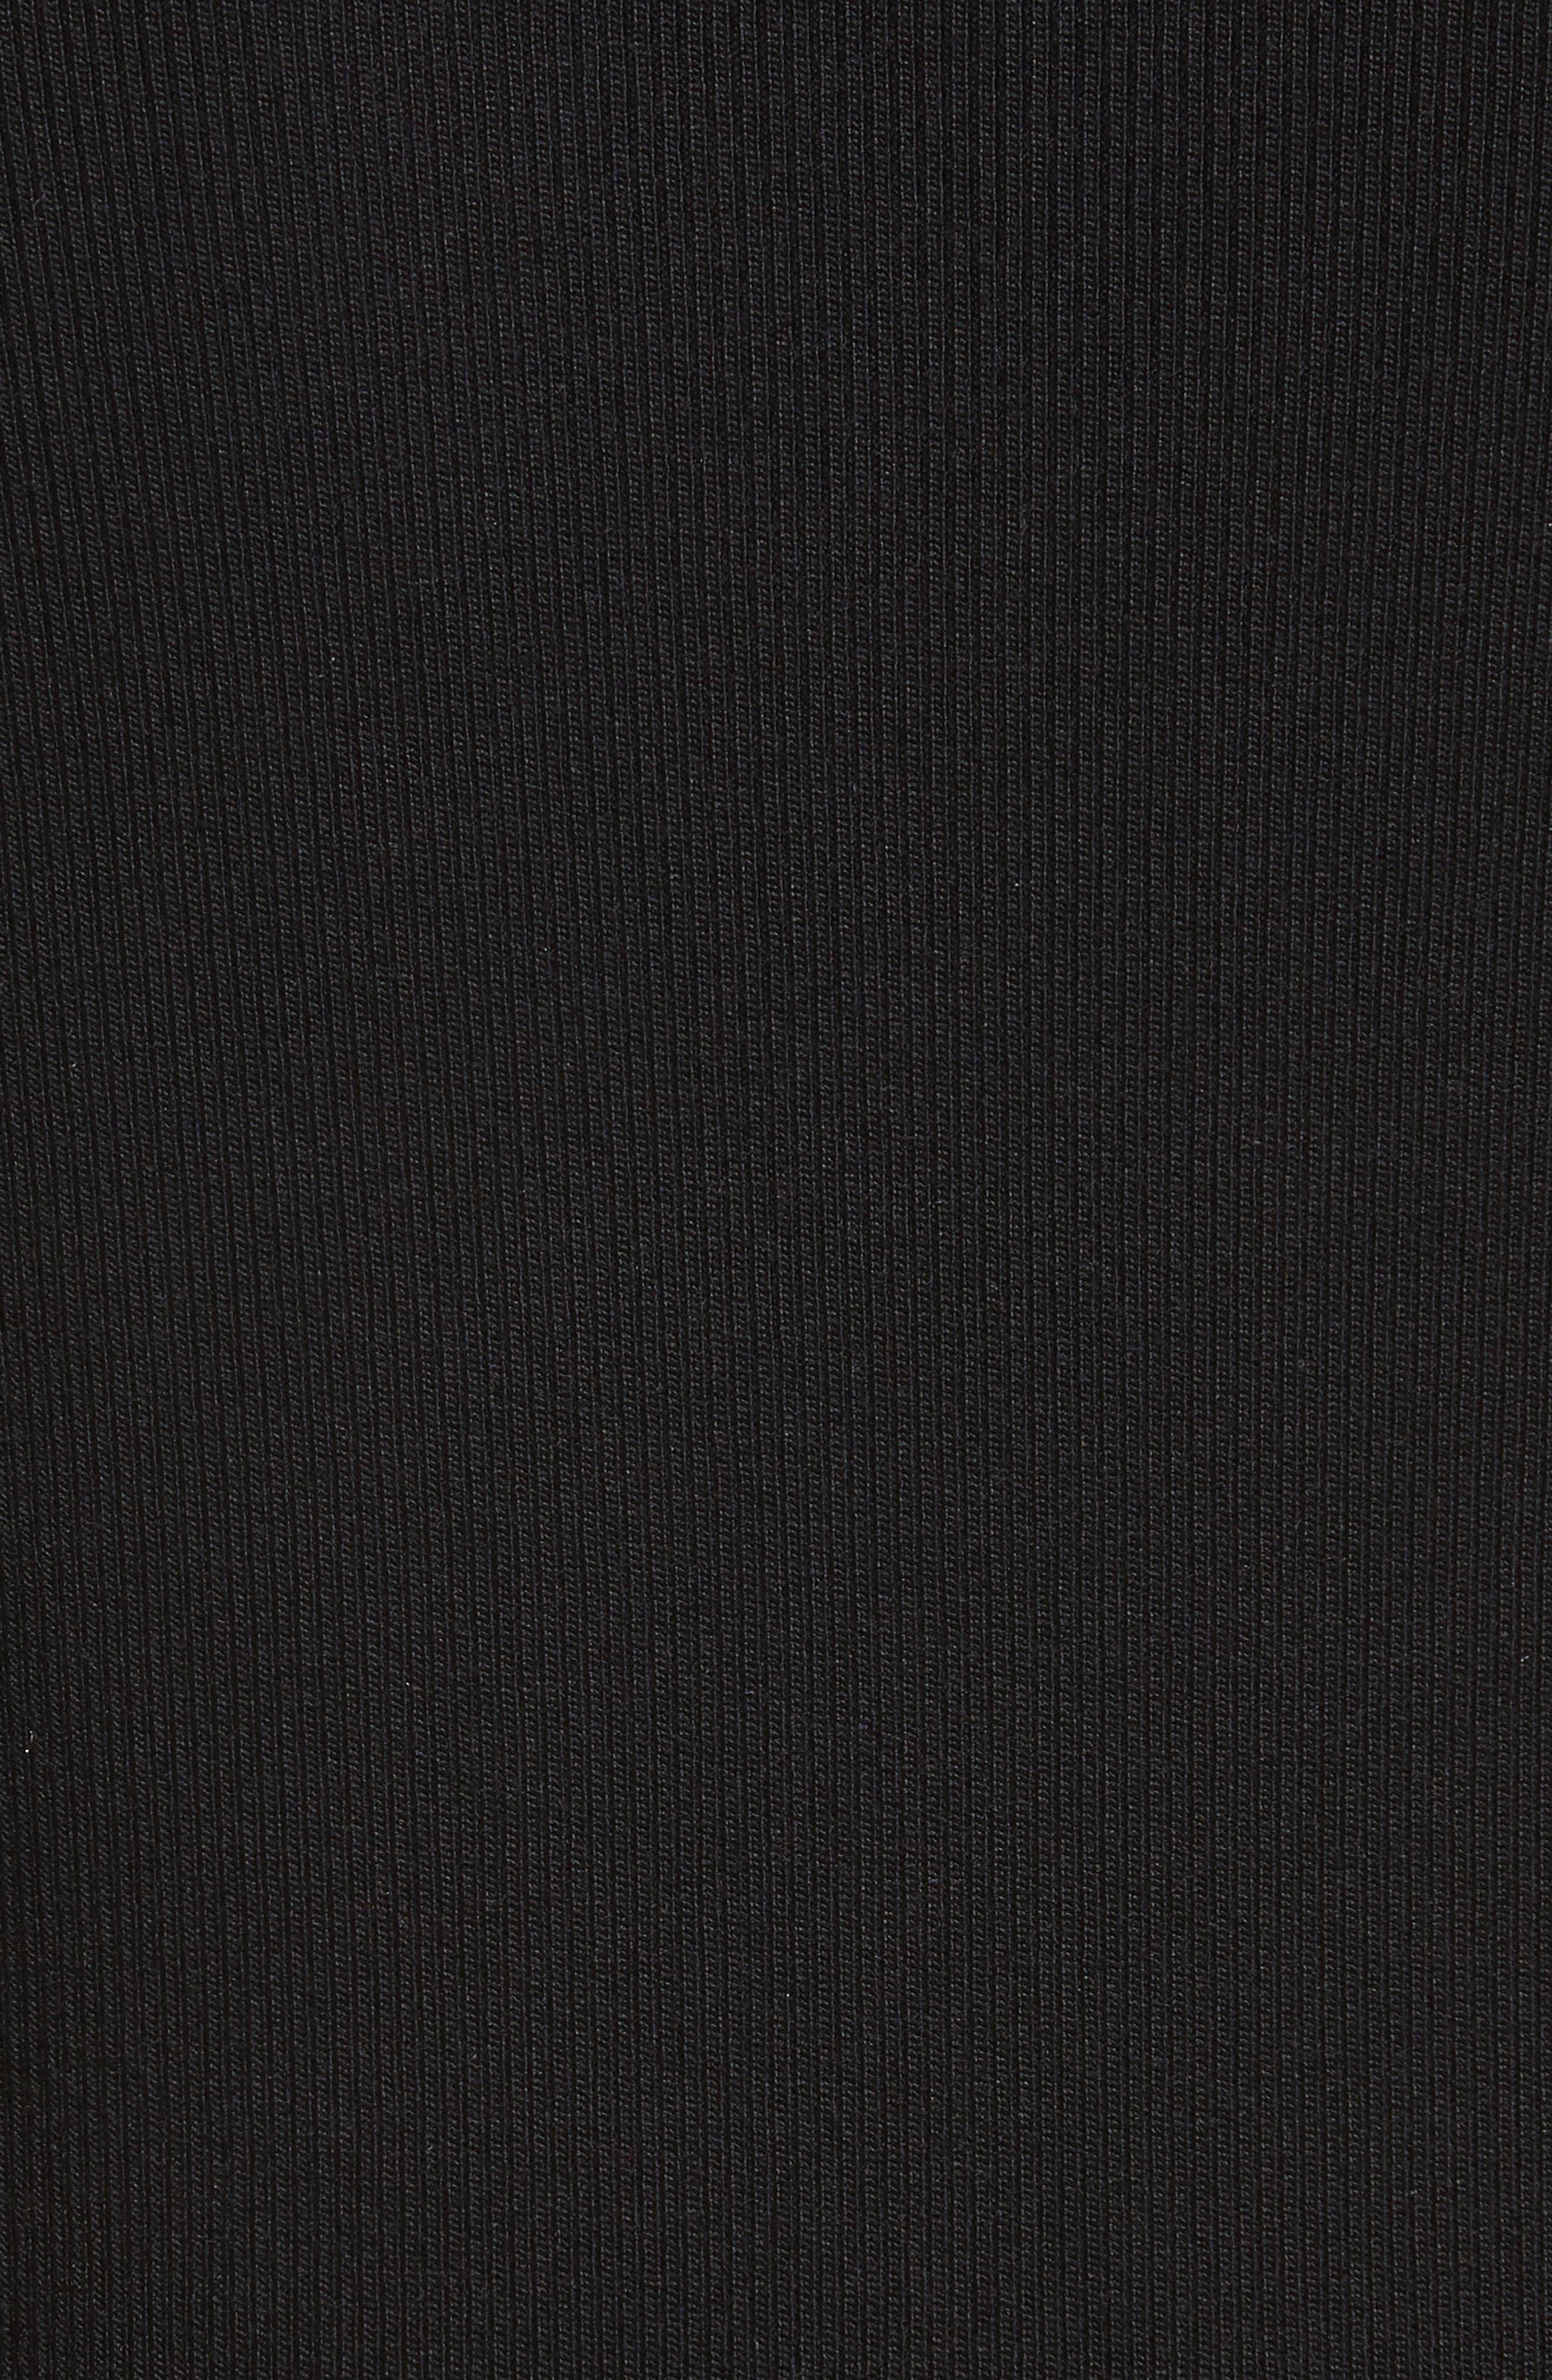 Rib Knit Silk Blend Sweater,                             Alternate thumbnail 5, color,                             001